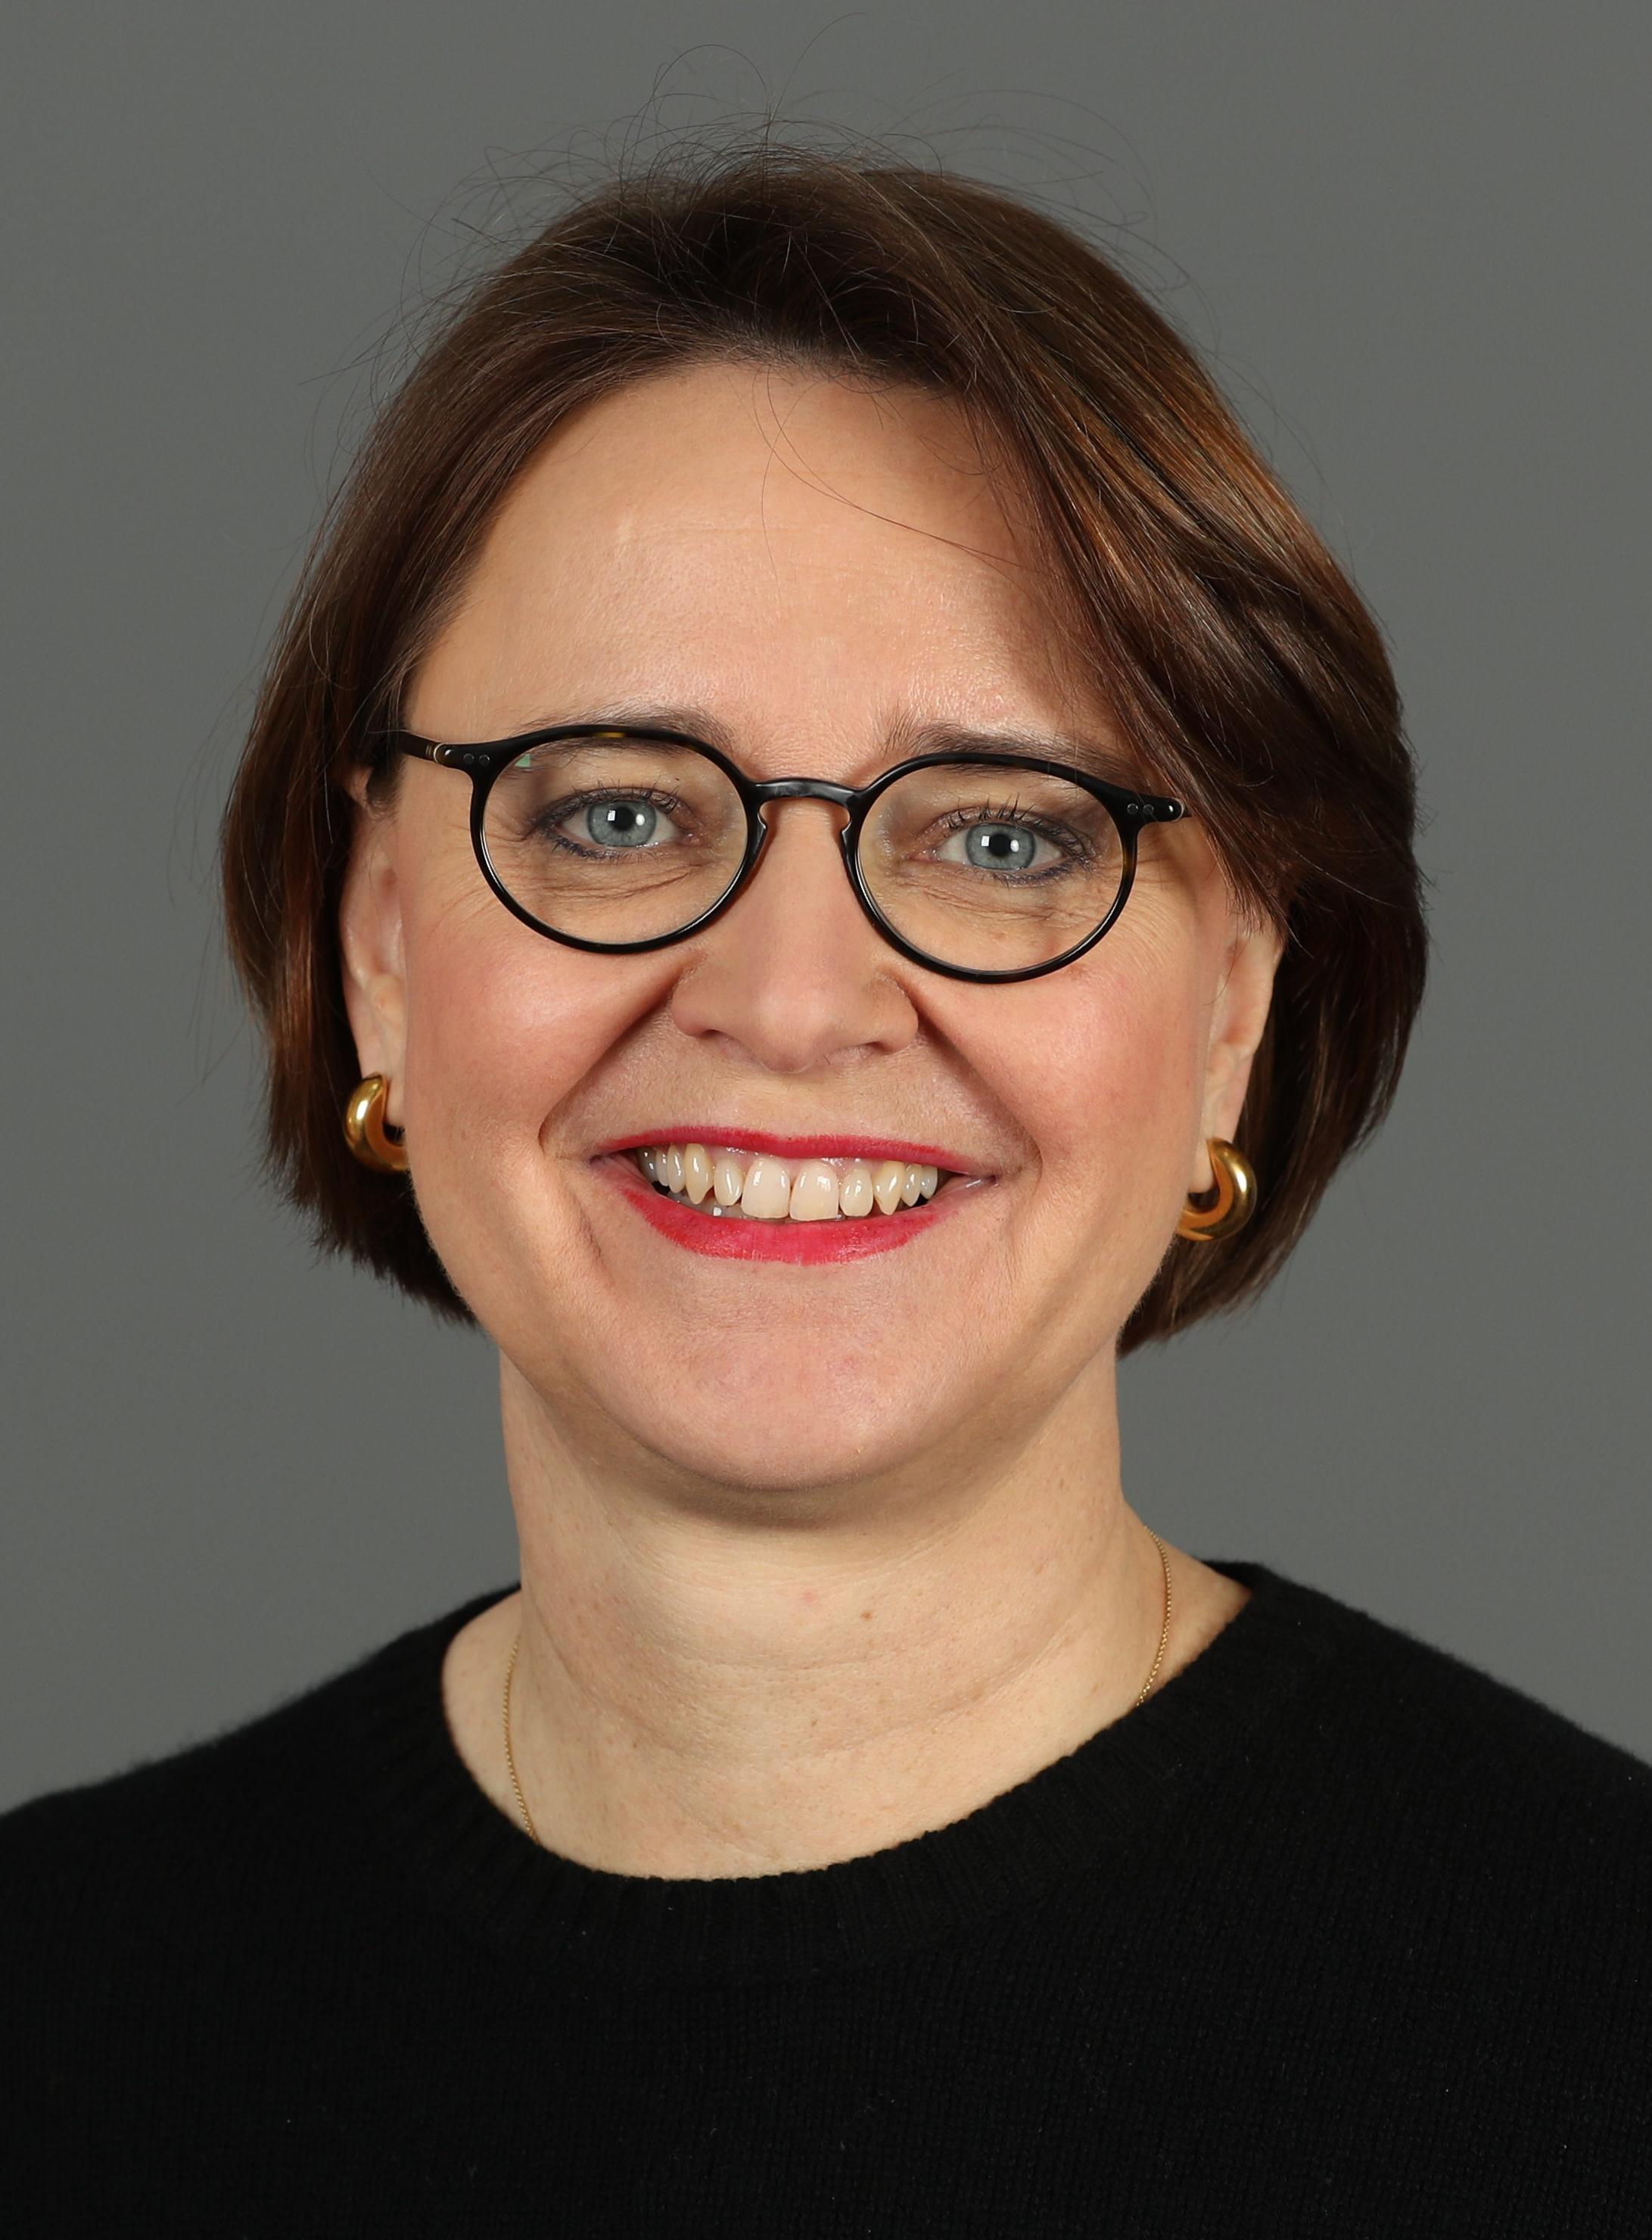 Annette Widmann Mauz Wikipedia